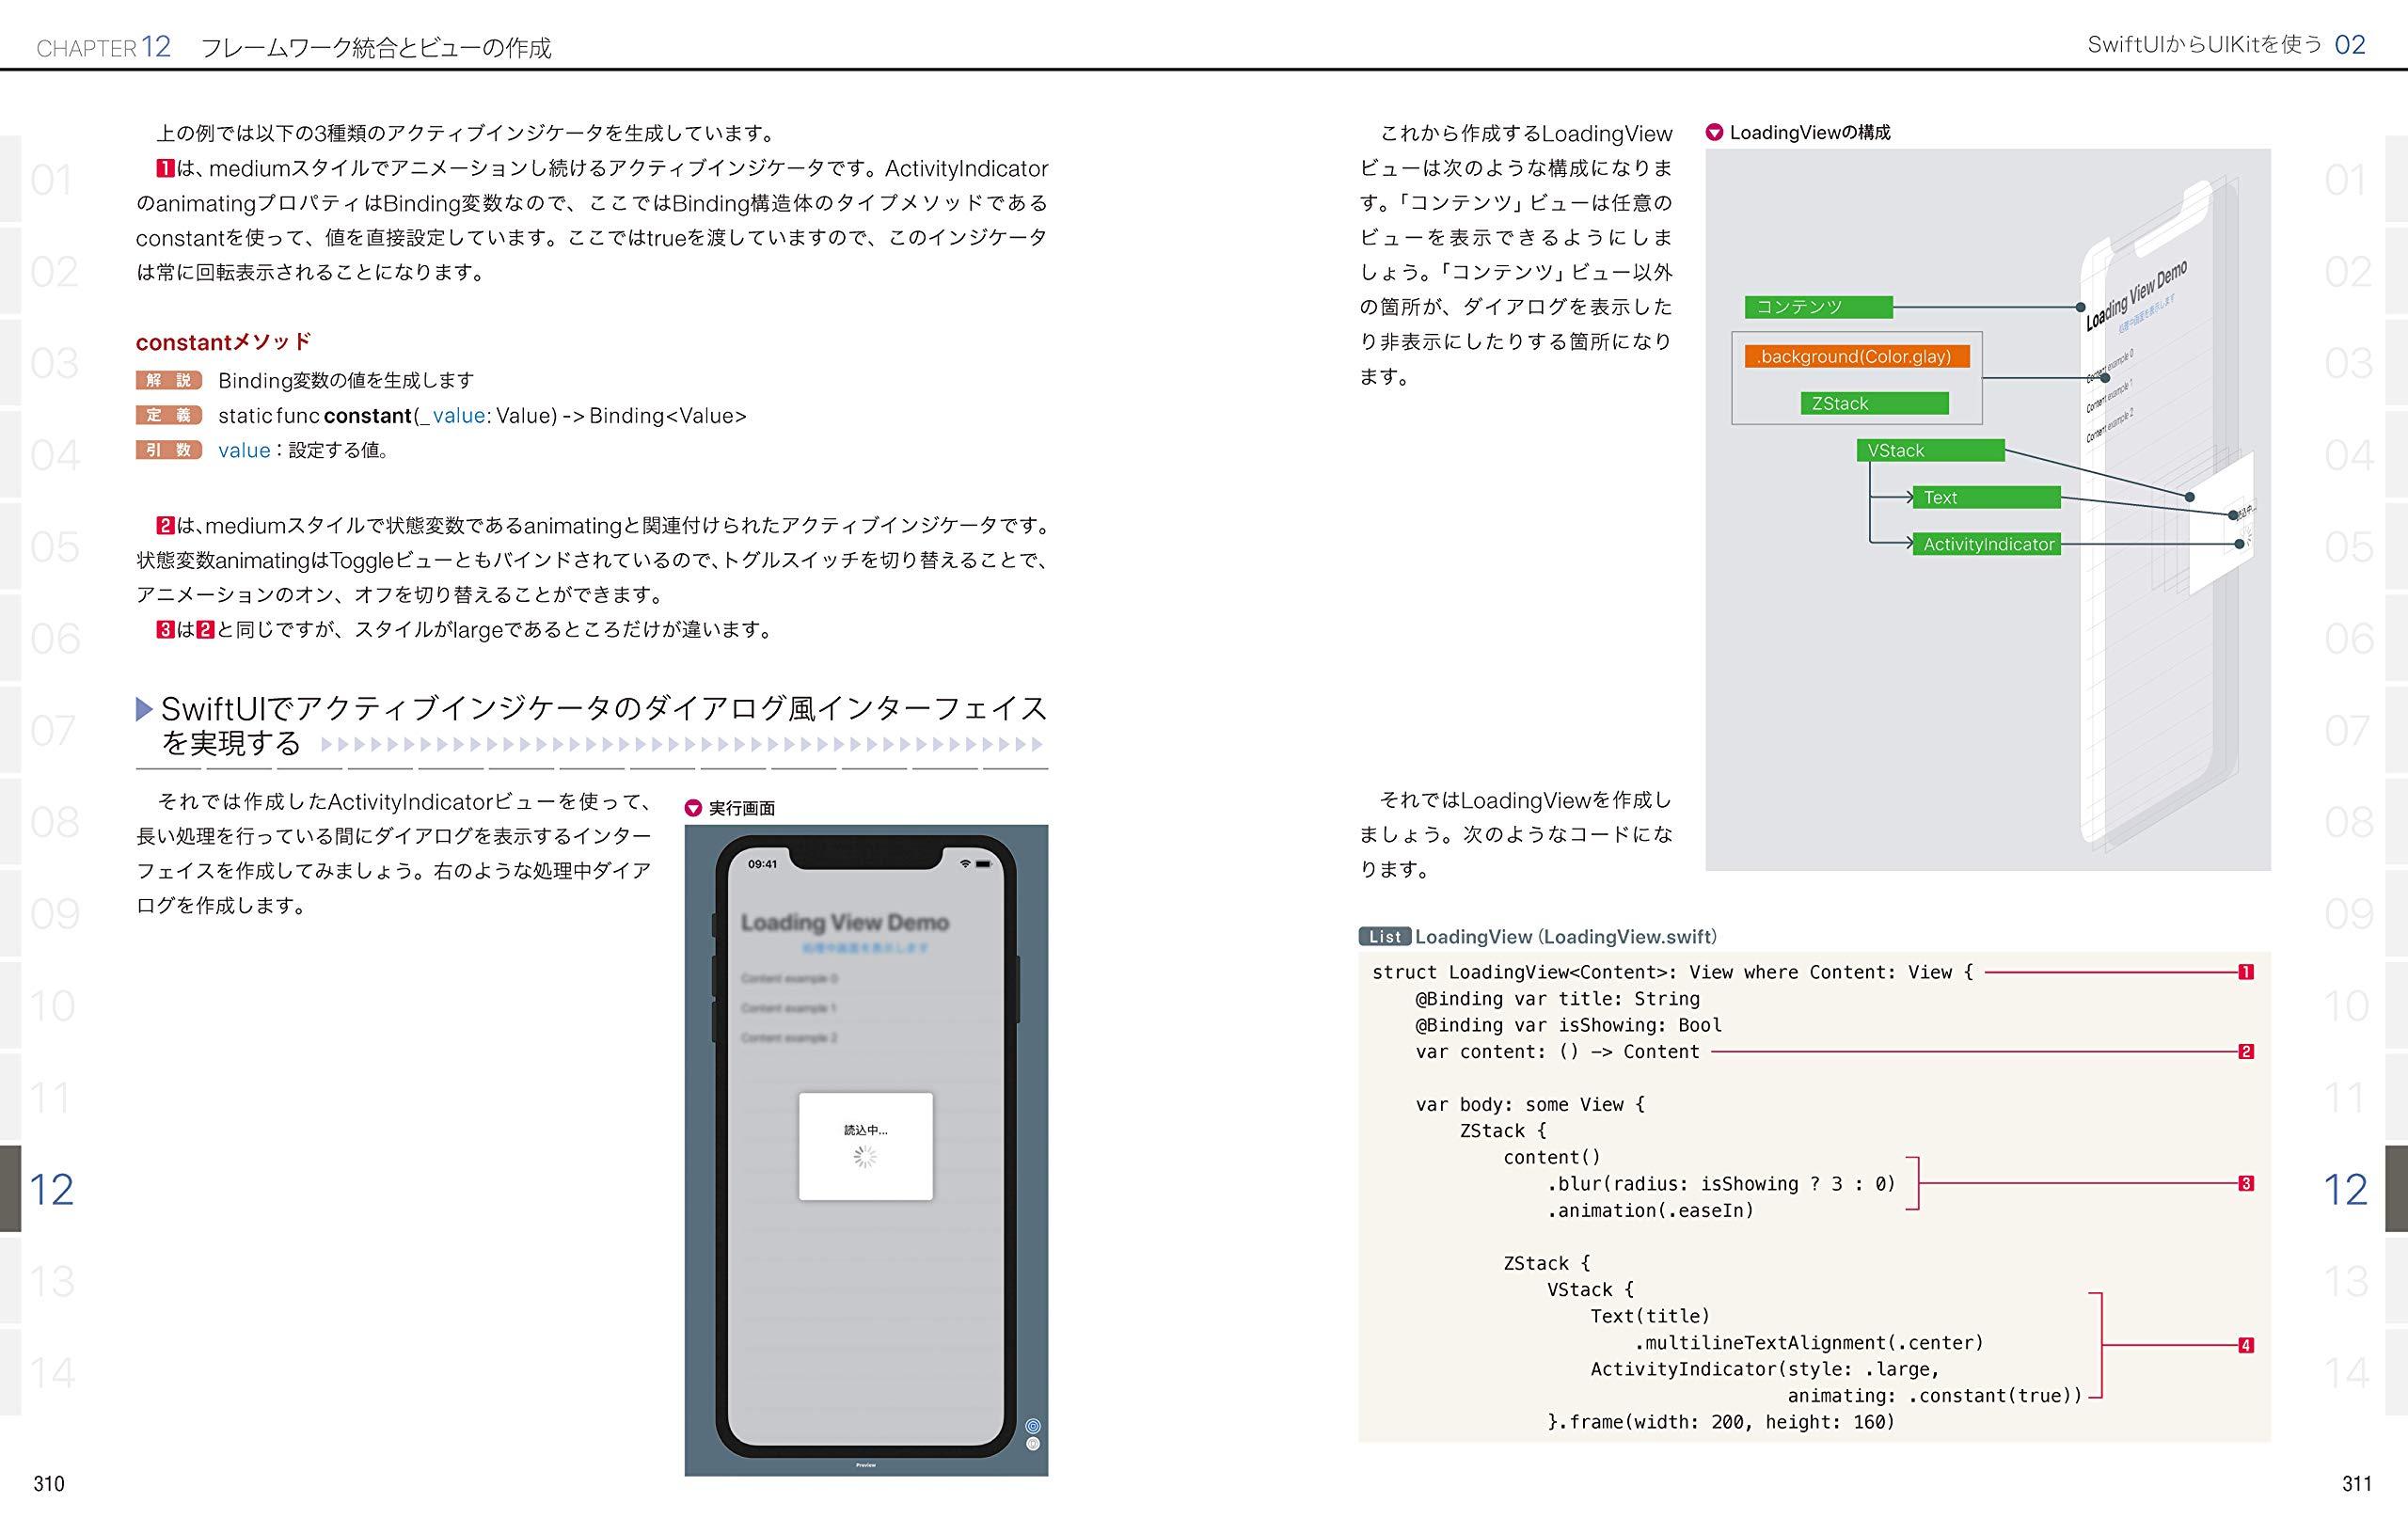 Thumbnail of SwiftUI 徹底入門6$